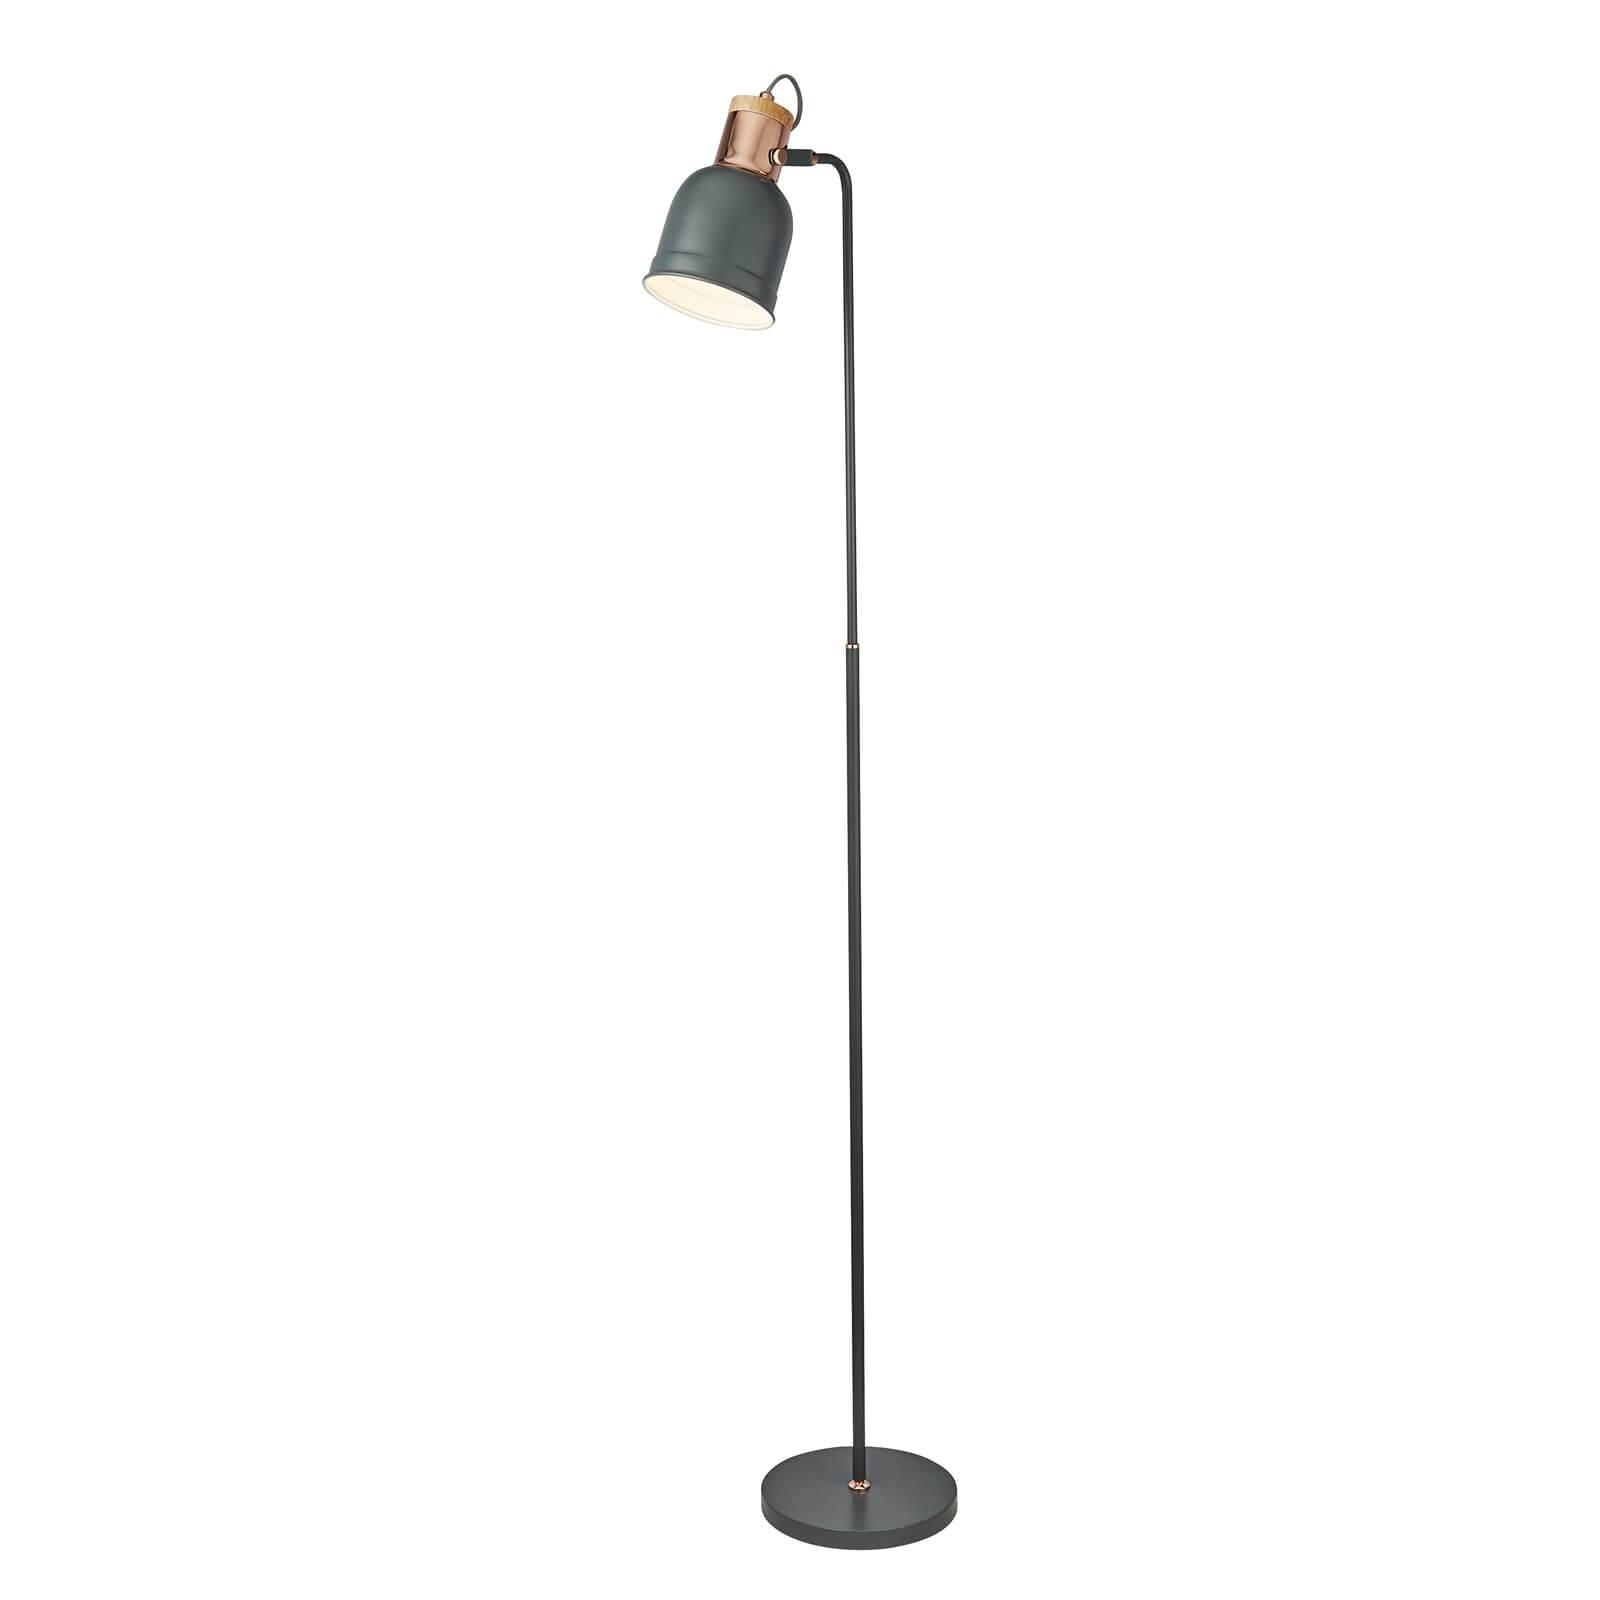 Barham Floor Lamp - Matt Grey and Copper